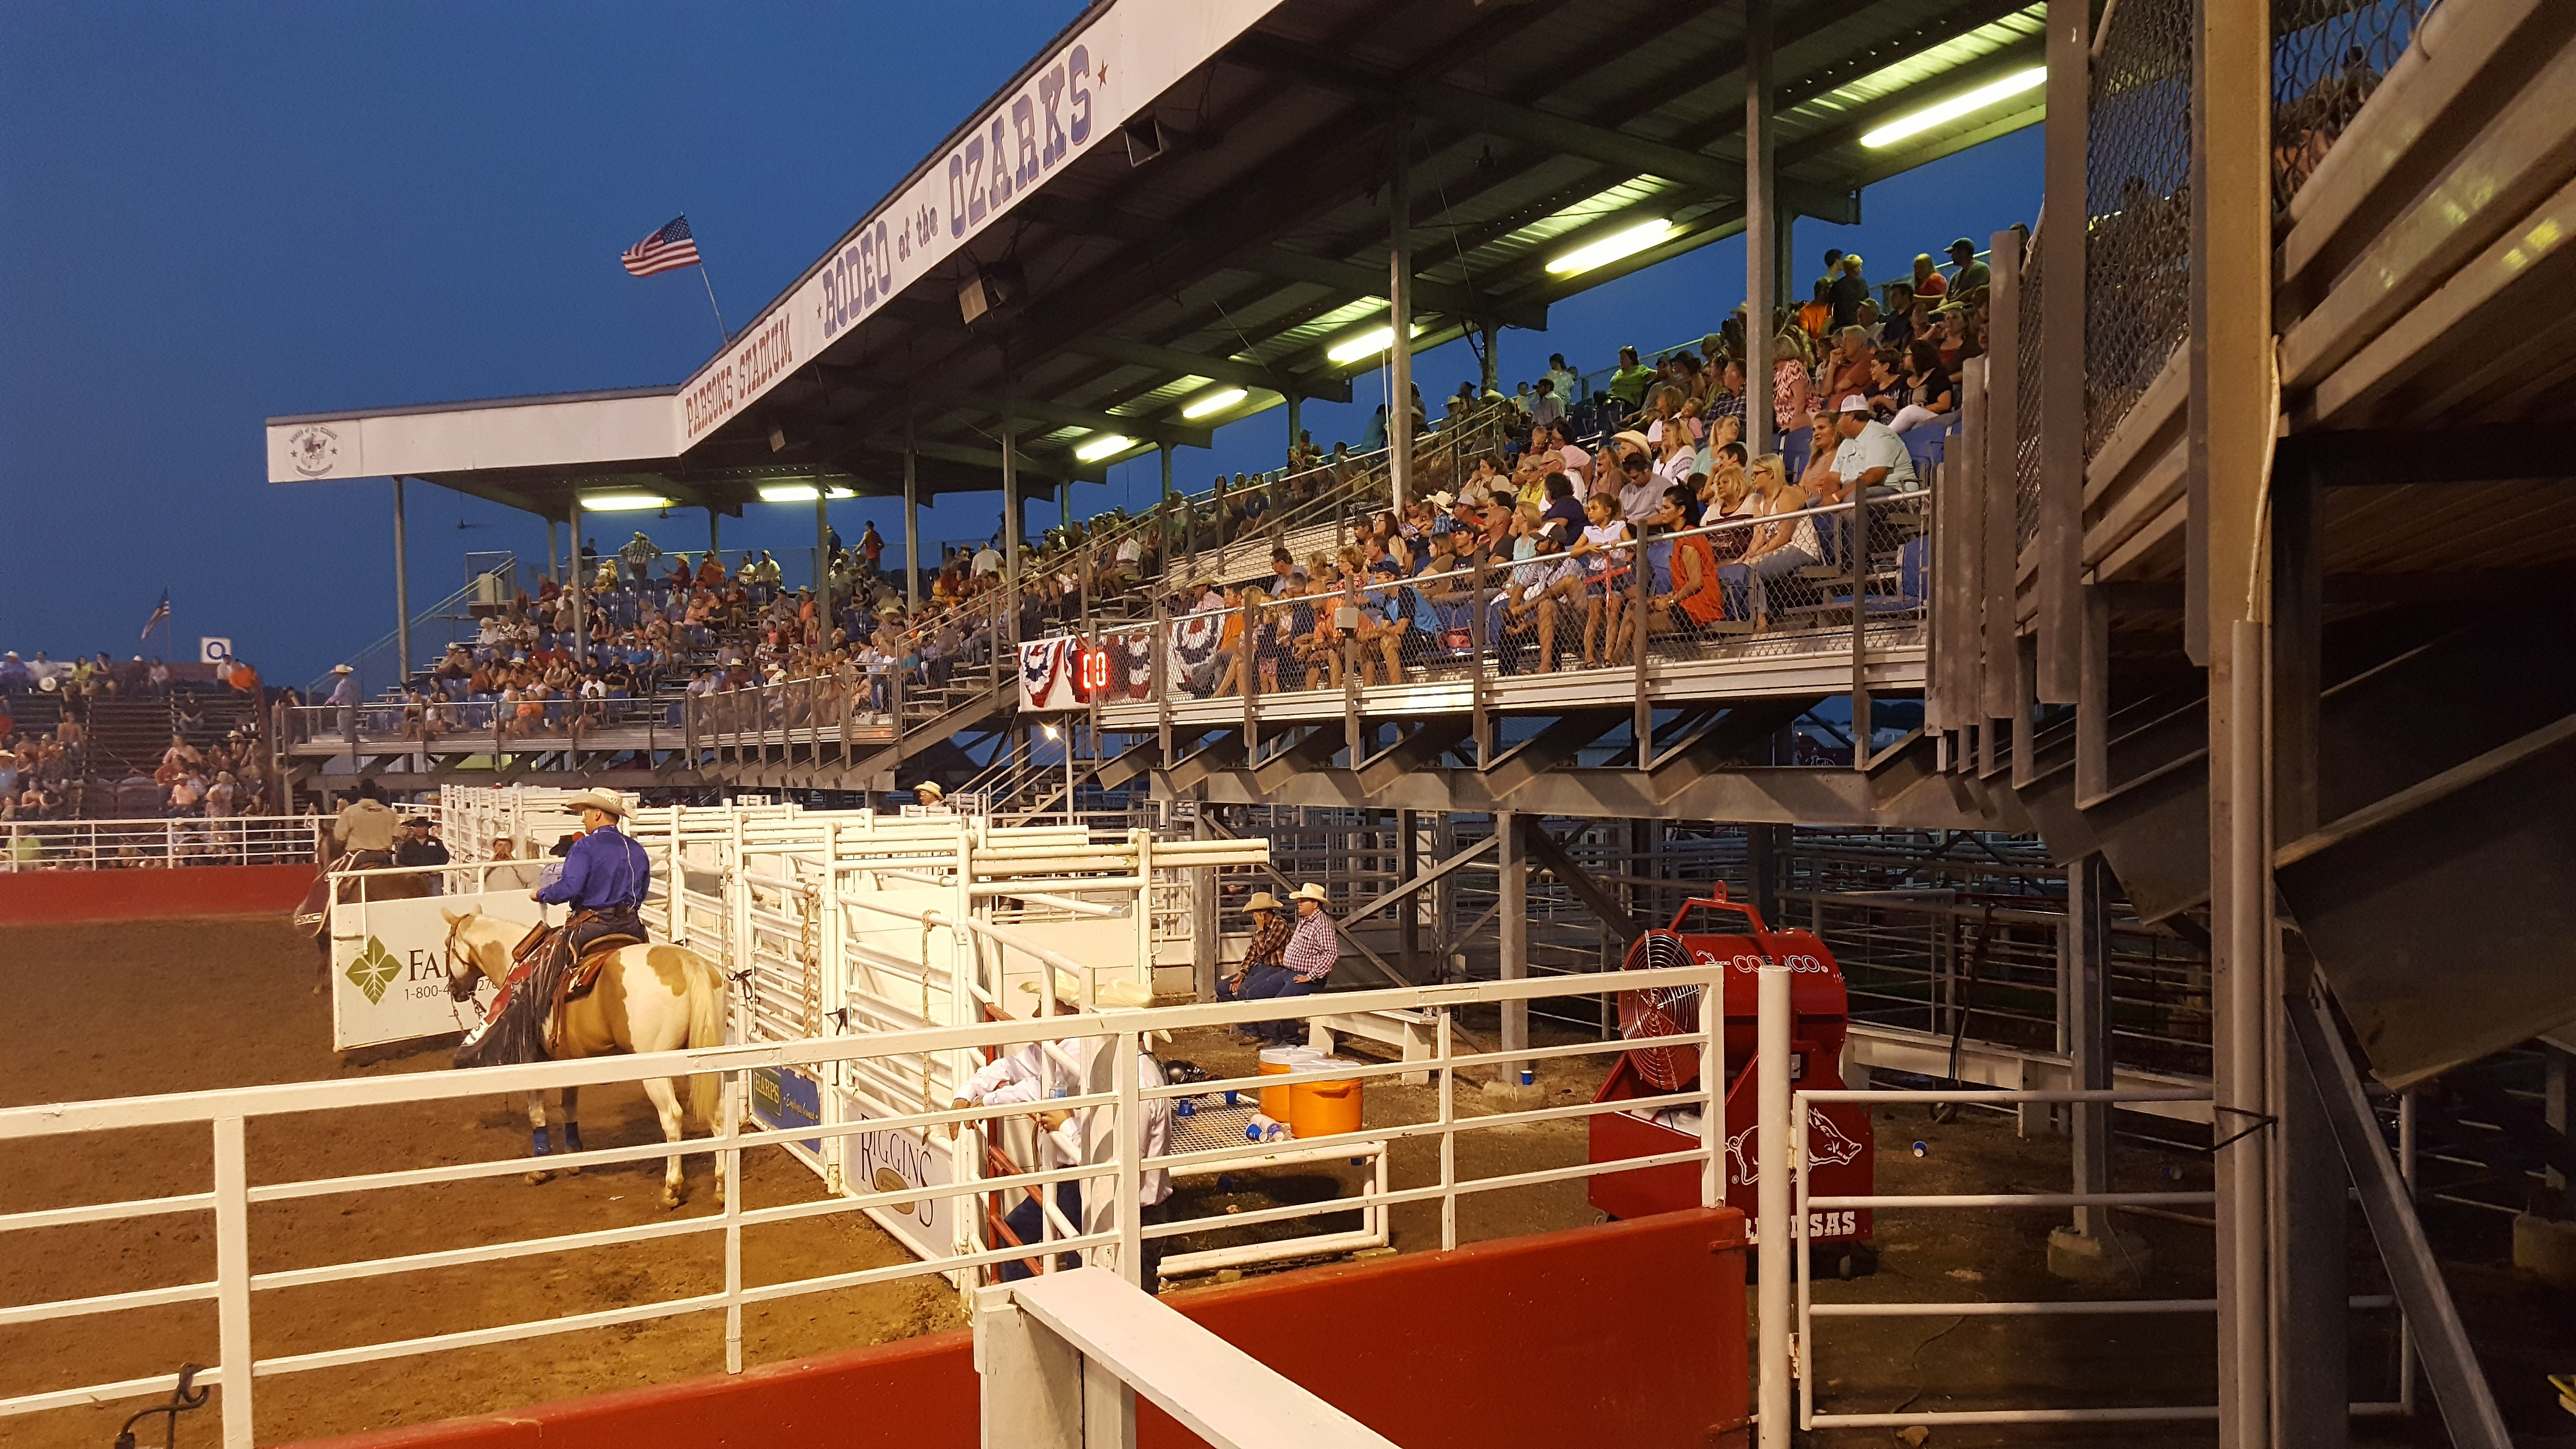 About Rodeo Of The Ozarks Rodeo Of The Ozarks